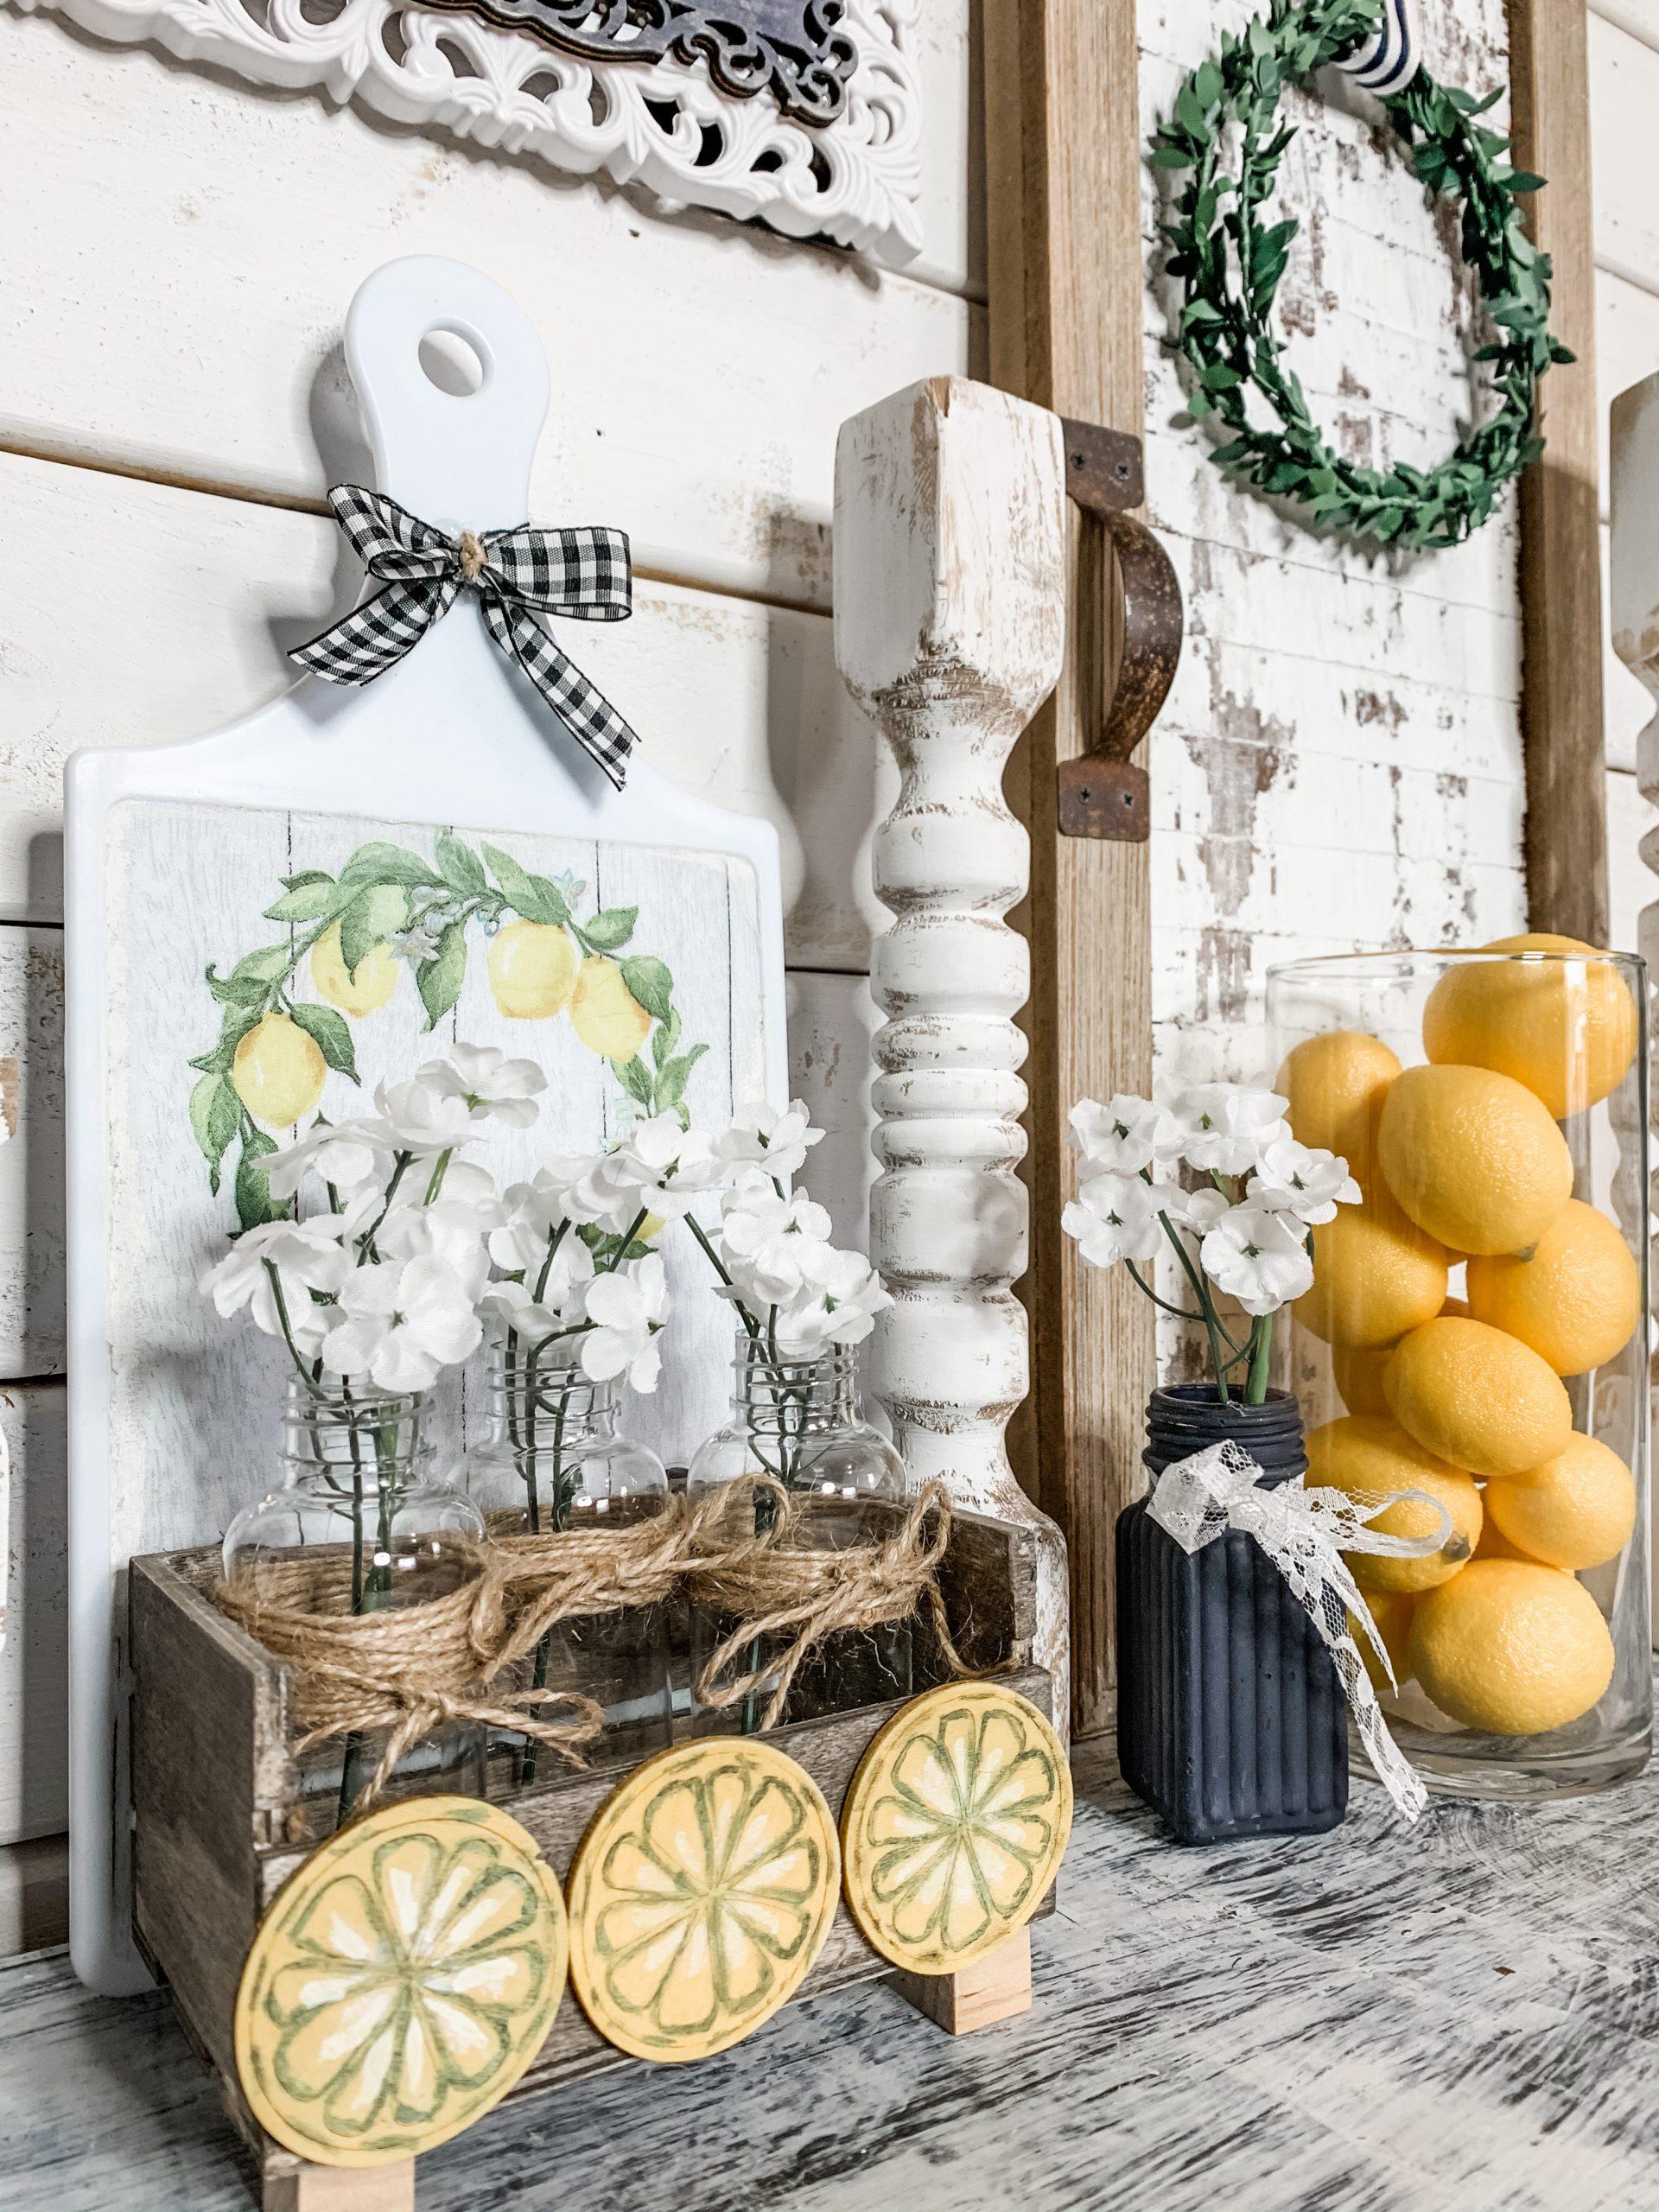 Dollar Tree DIY Farmhouse Lemon Cutting Board Decor